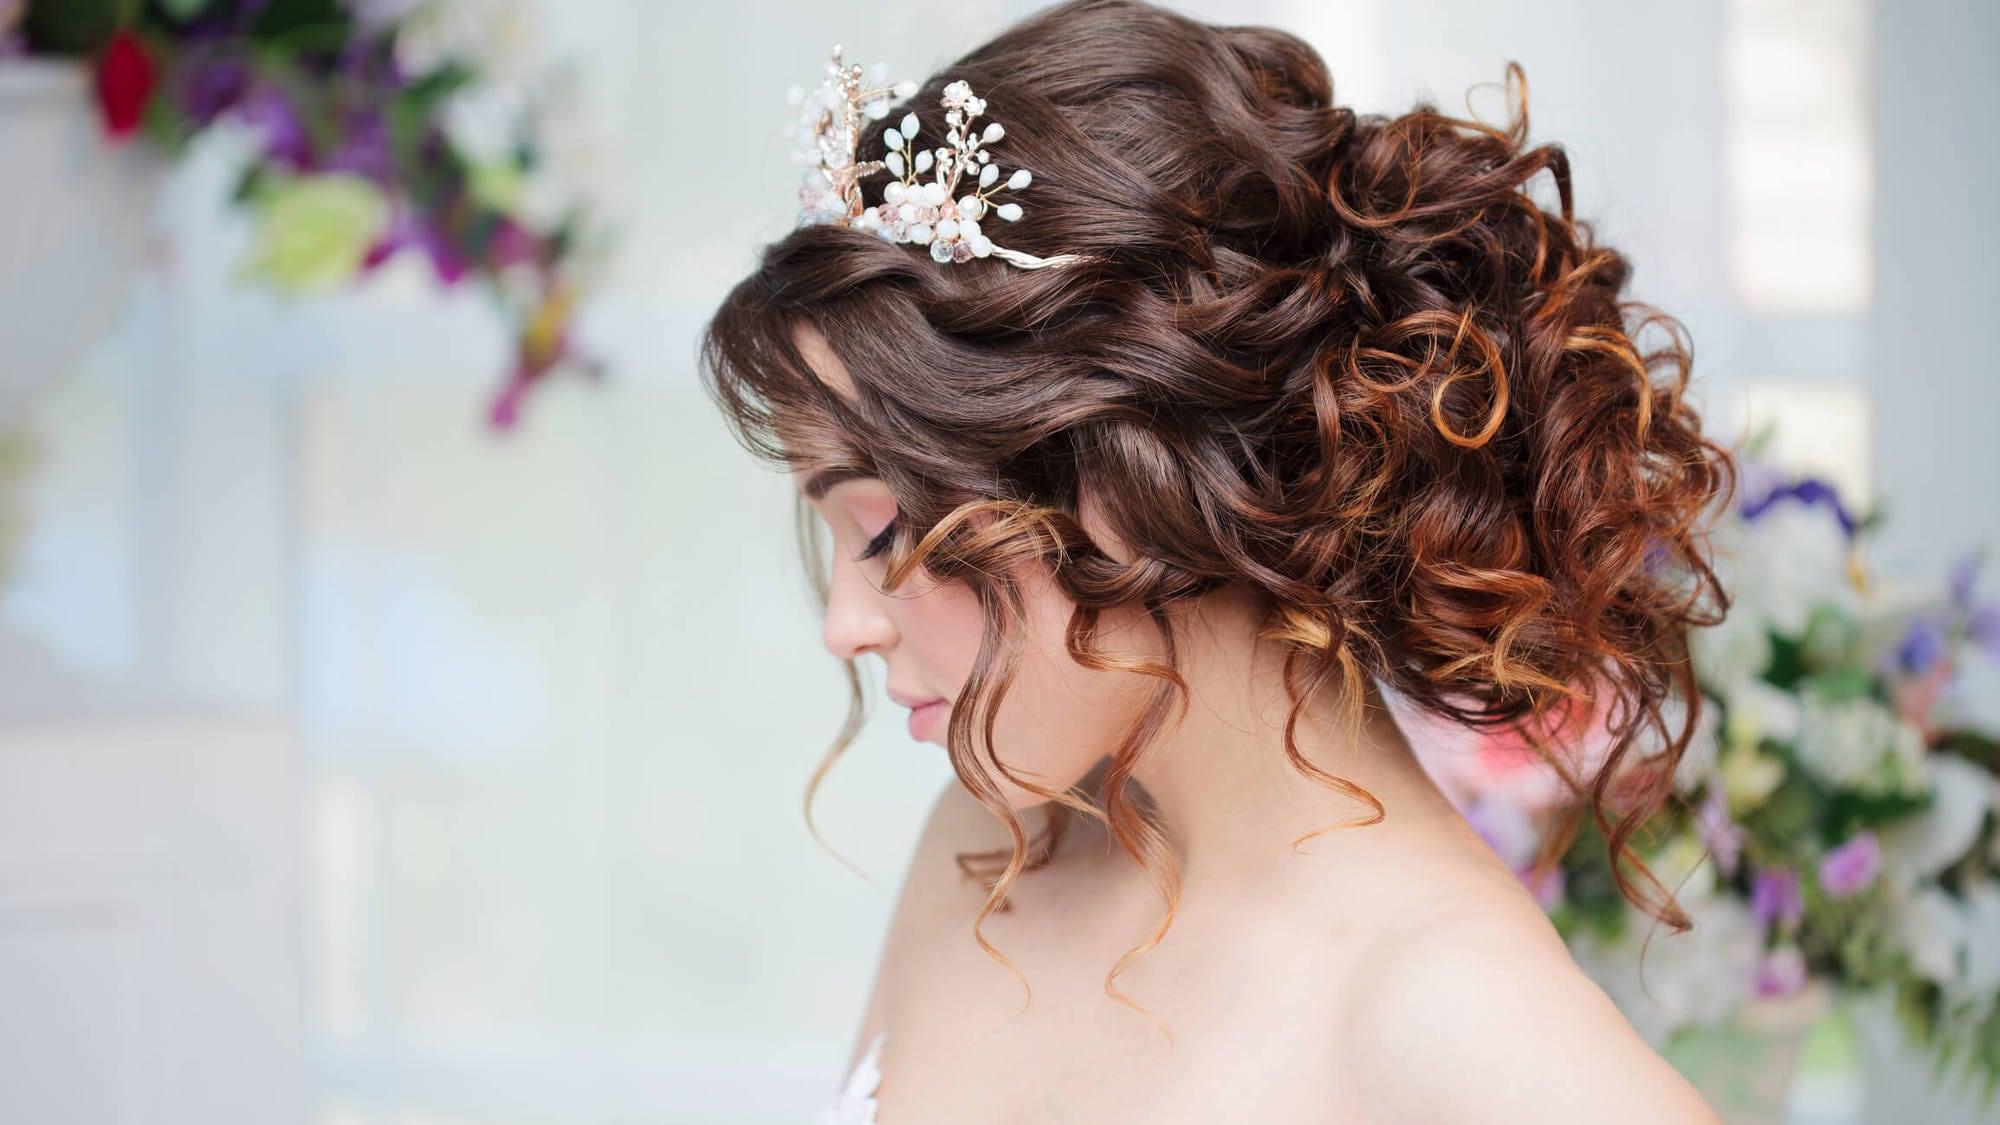 peinados para boda de noche recogido racimo de uvas